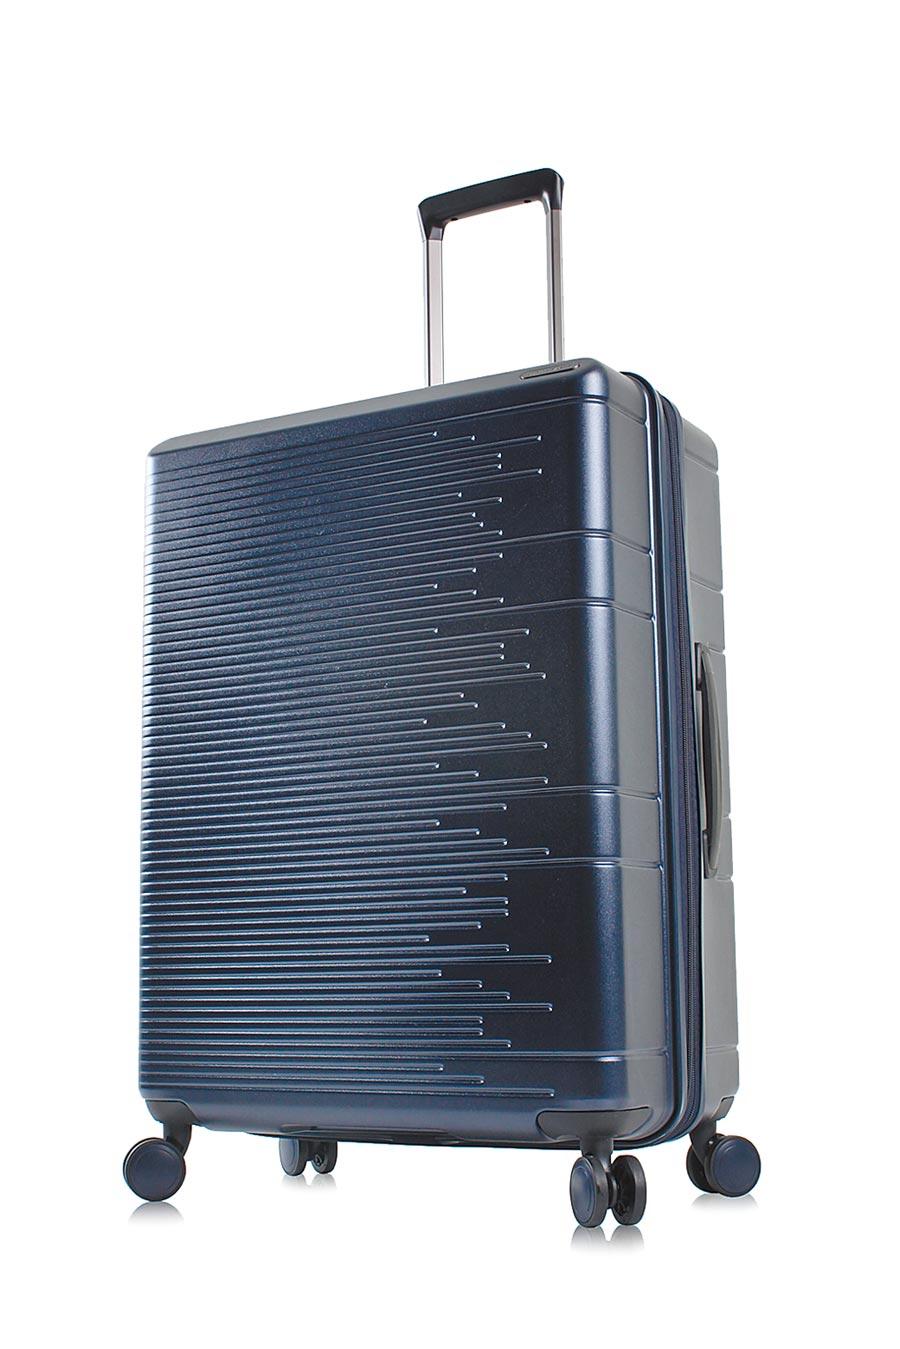 MONTAGUT輕量防爆拉鍊霧面行李箱24吋6680元,周年慶獨家特價3690元。(MONTAGUT提供)